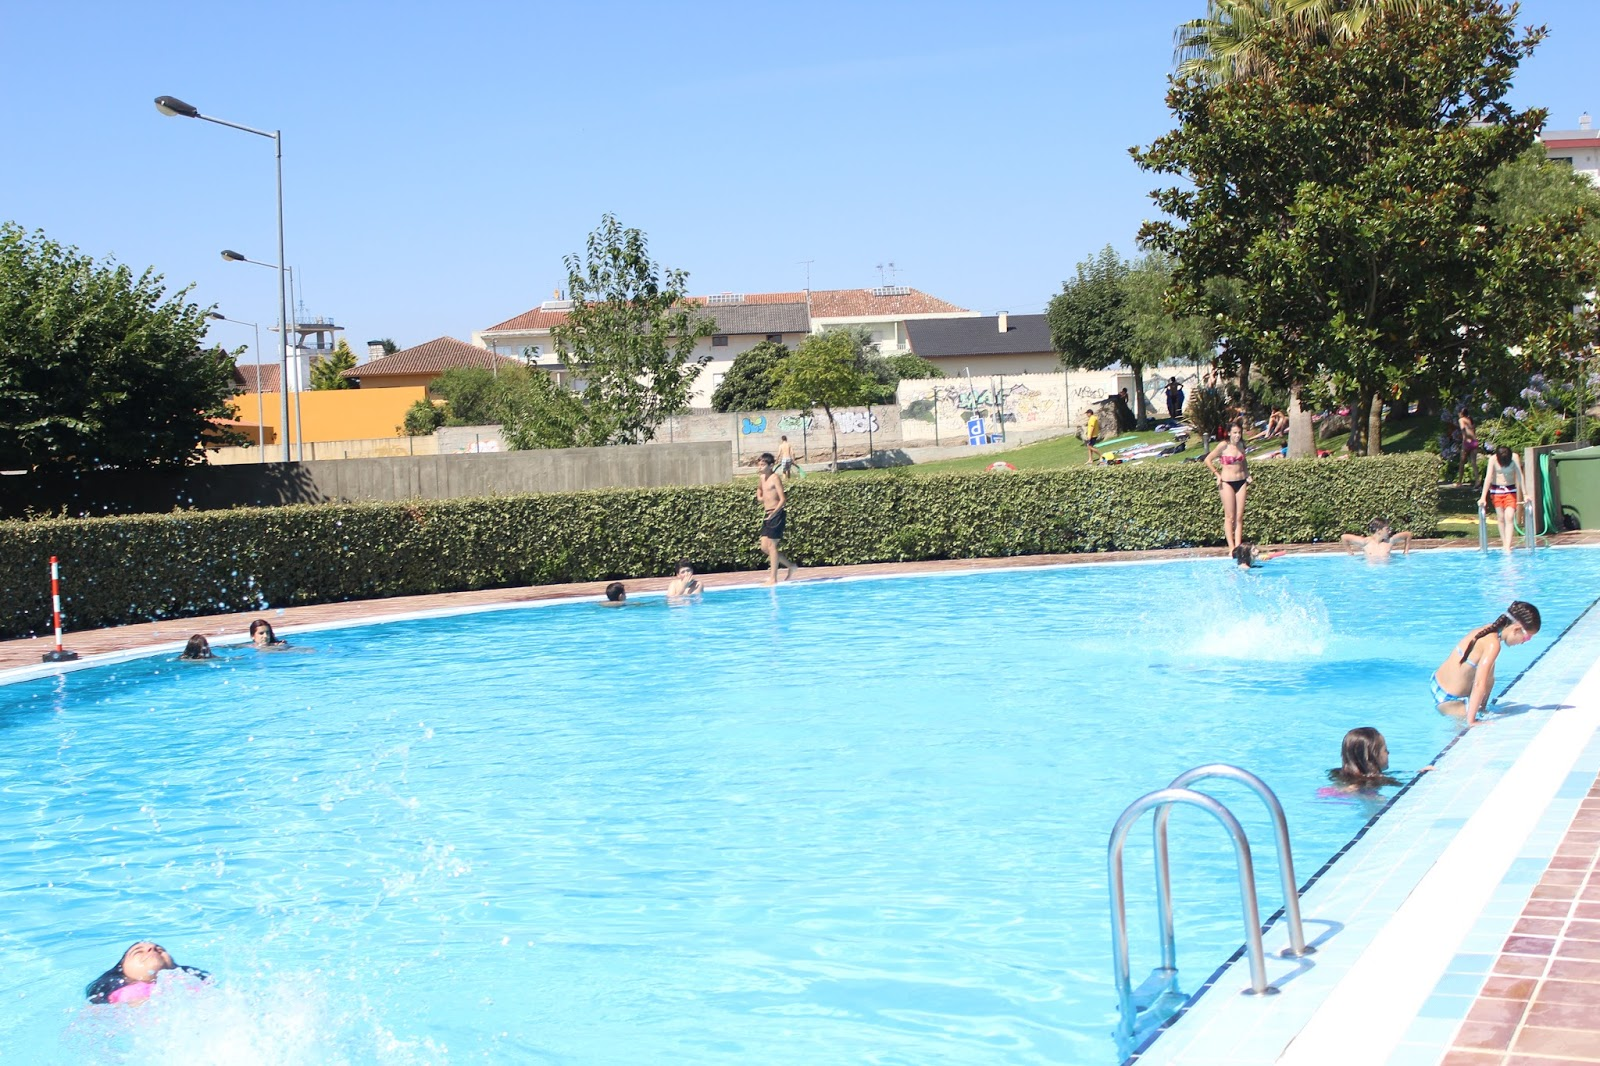 Reabertura da piscinas exteriores de Mangualde